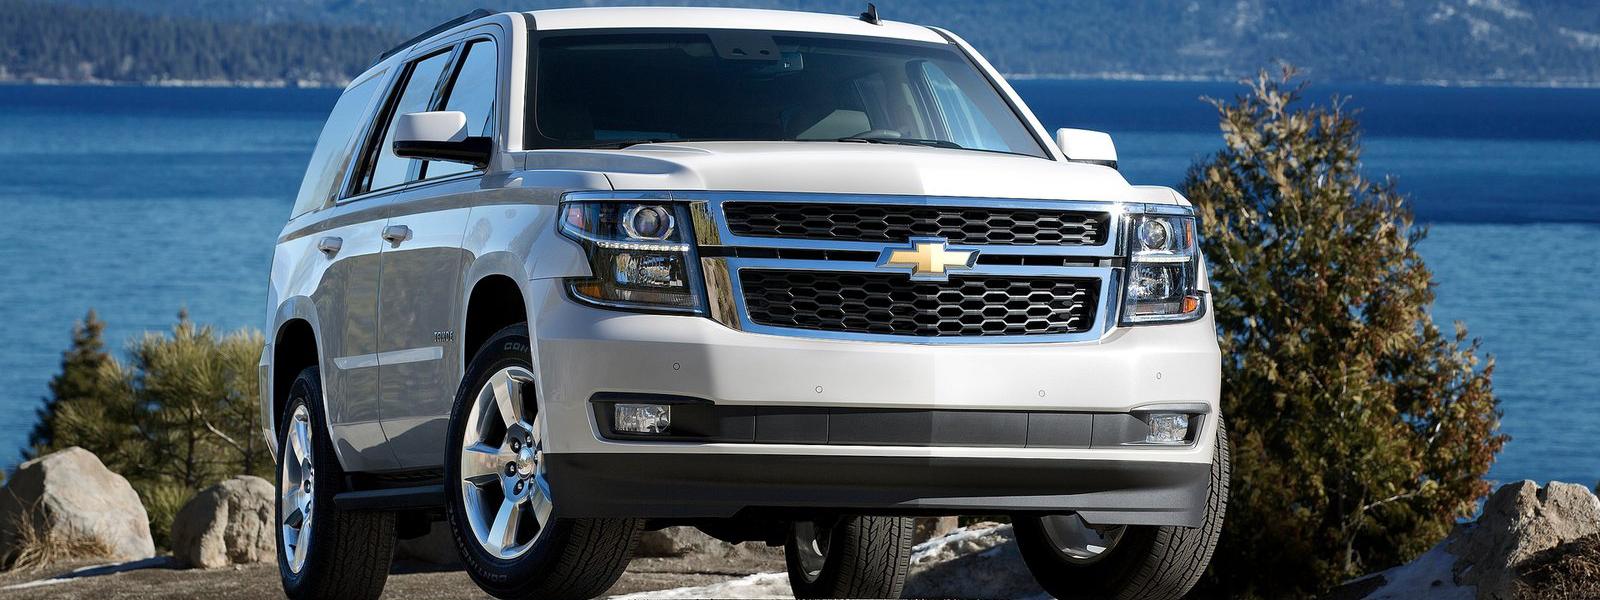 Jacks Used Cars LLC In Rocky Mount NC, We Buy, Sell, Finance